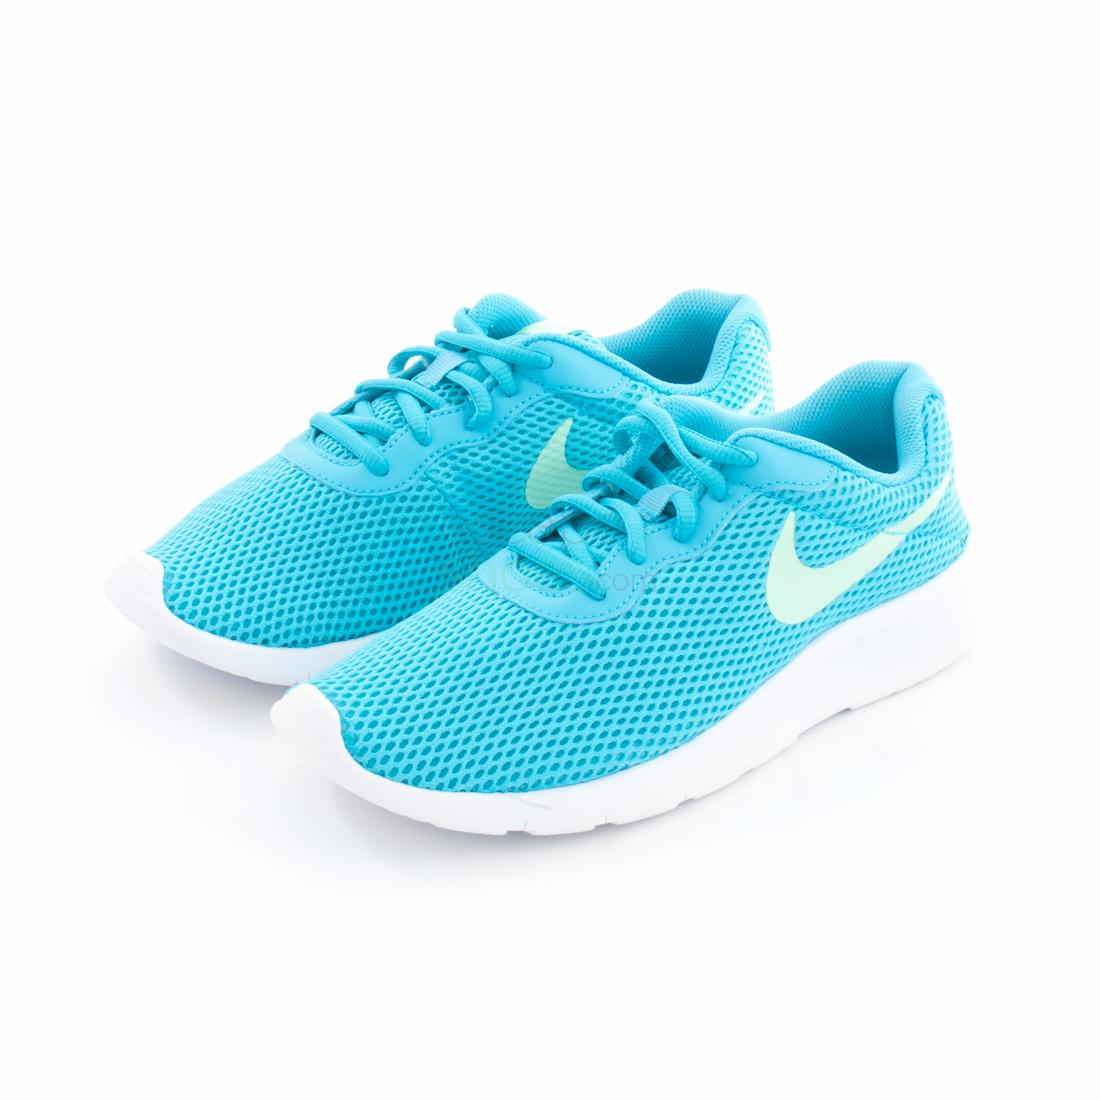 Mint Zapatillas Chlorine Aquí Tanjun Tus Nike Blue Compra Fresh R8v7qHn